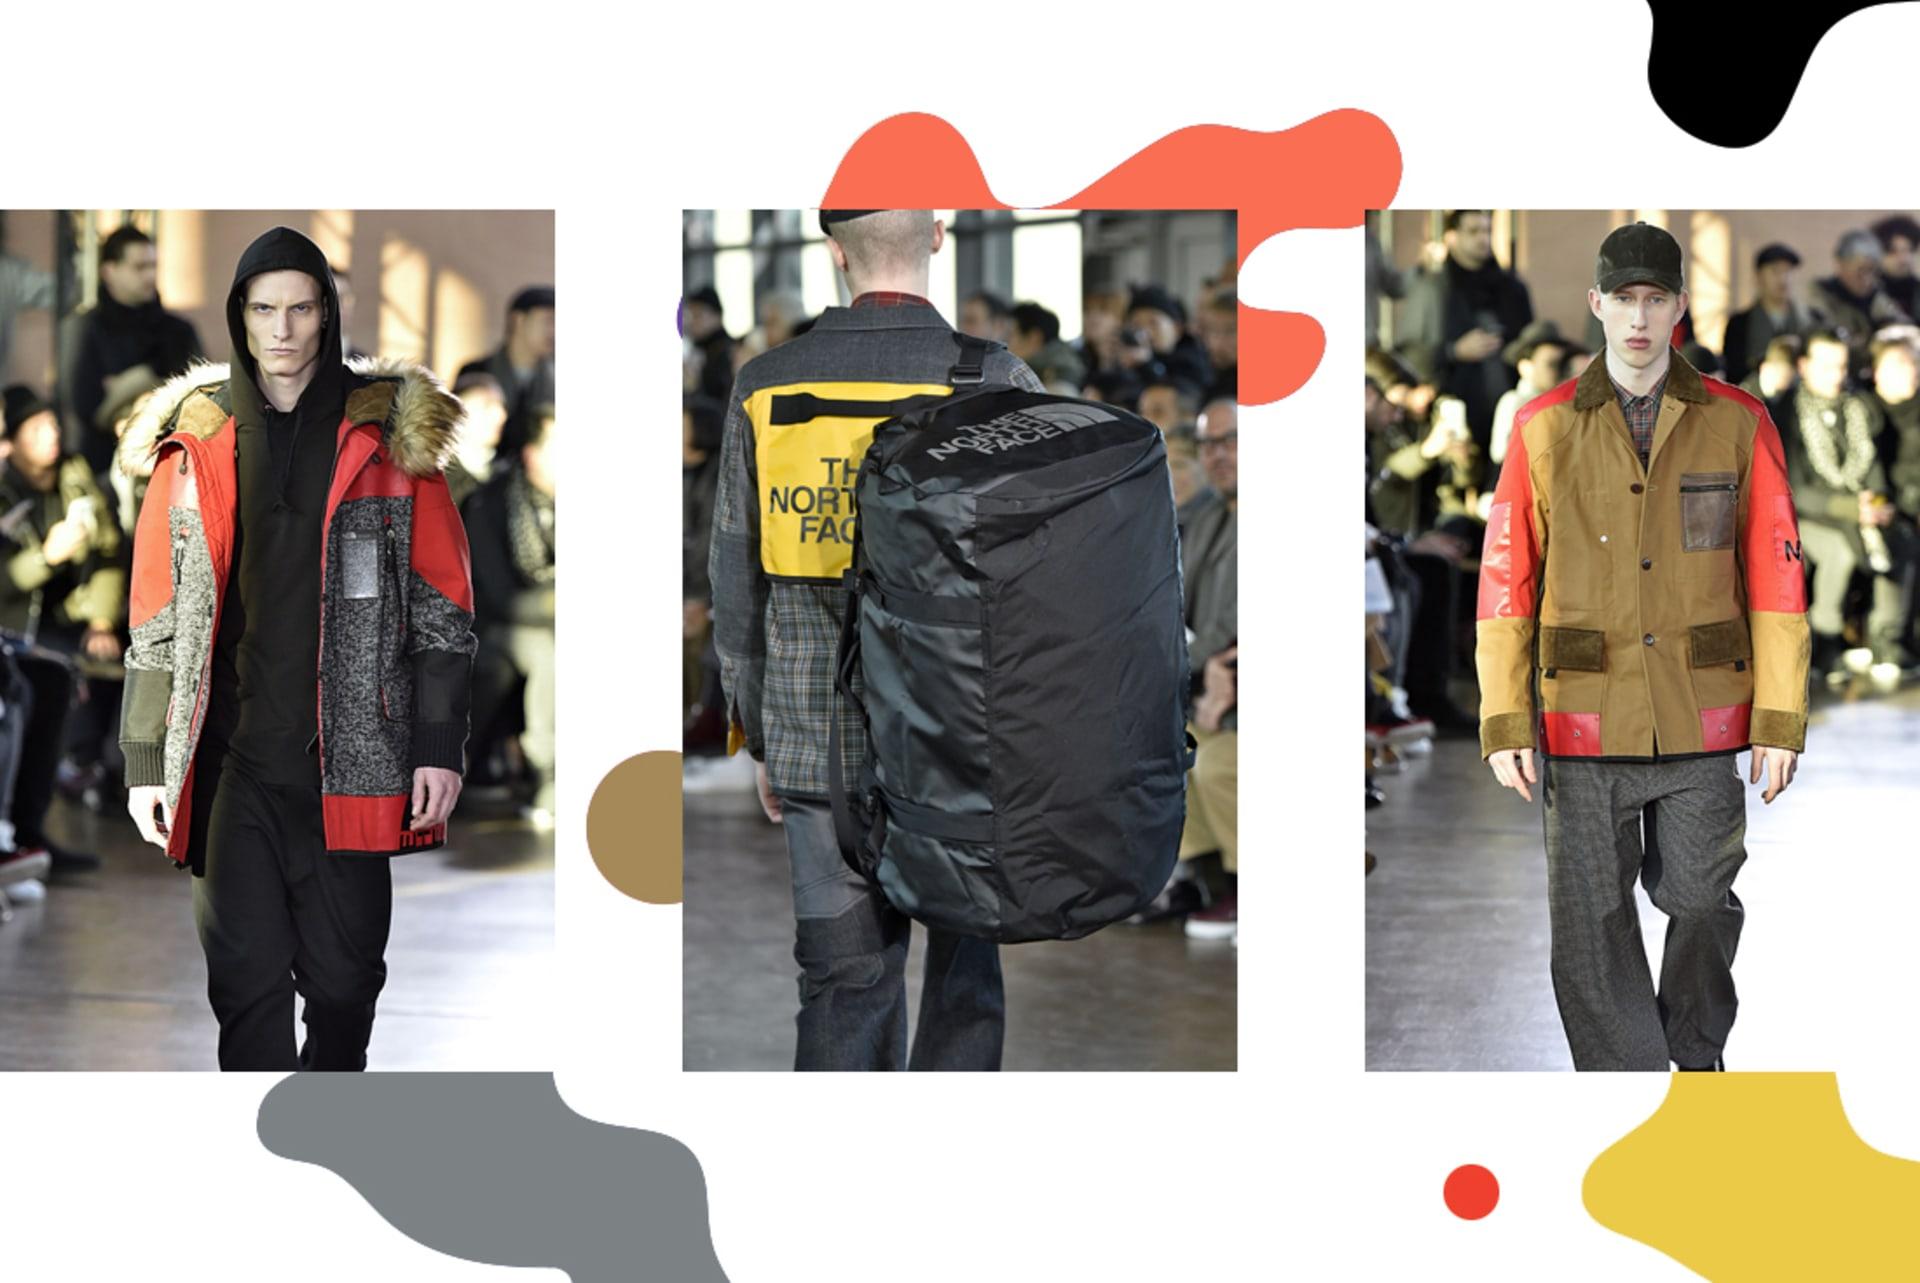 ad645d7da1f2 Best Streetwear Collaborations of 2017 | Complex